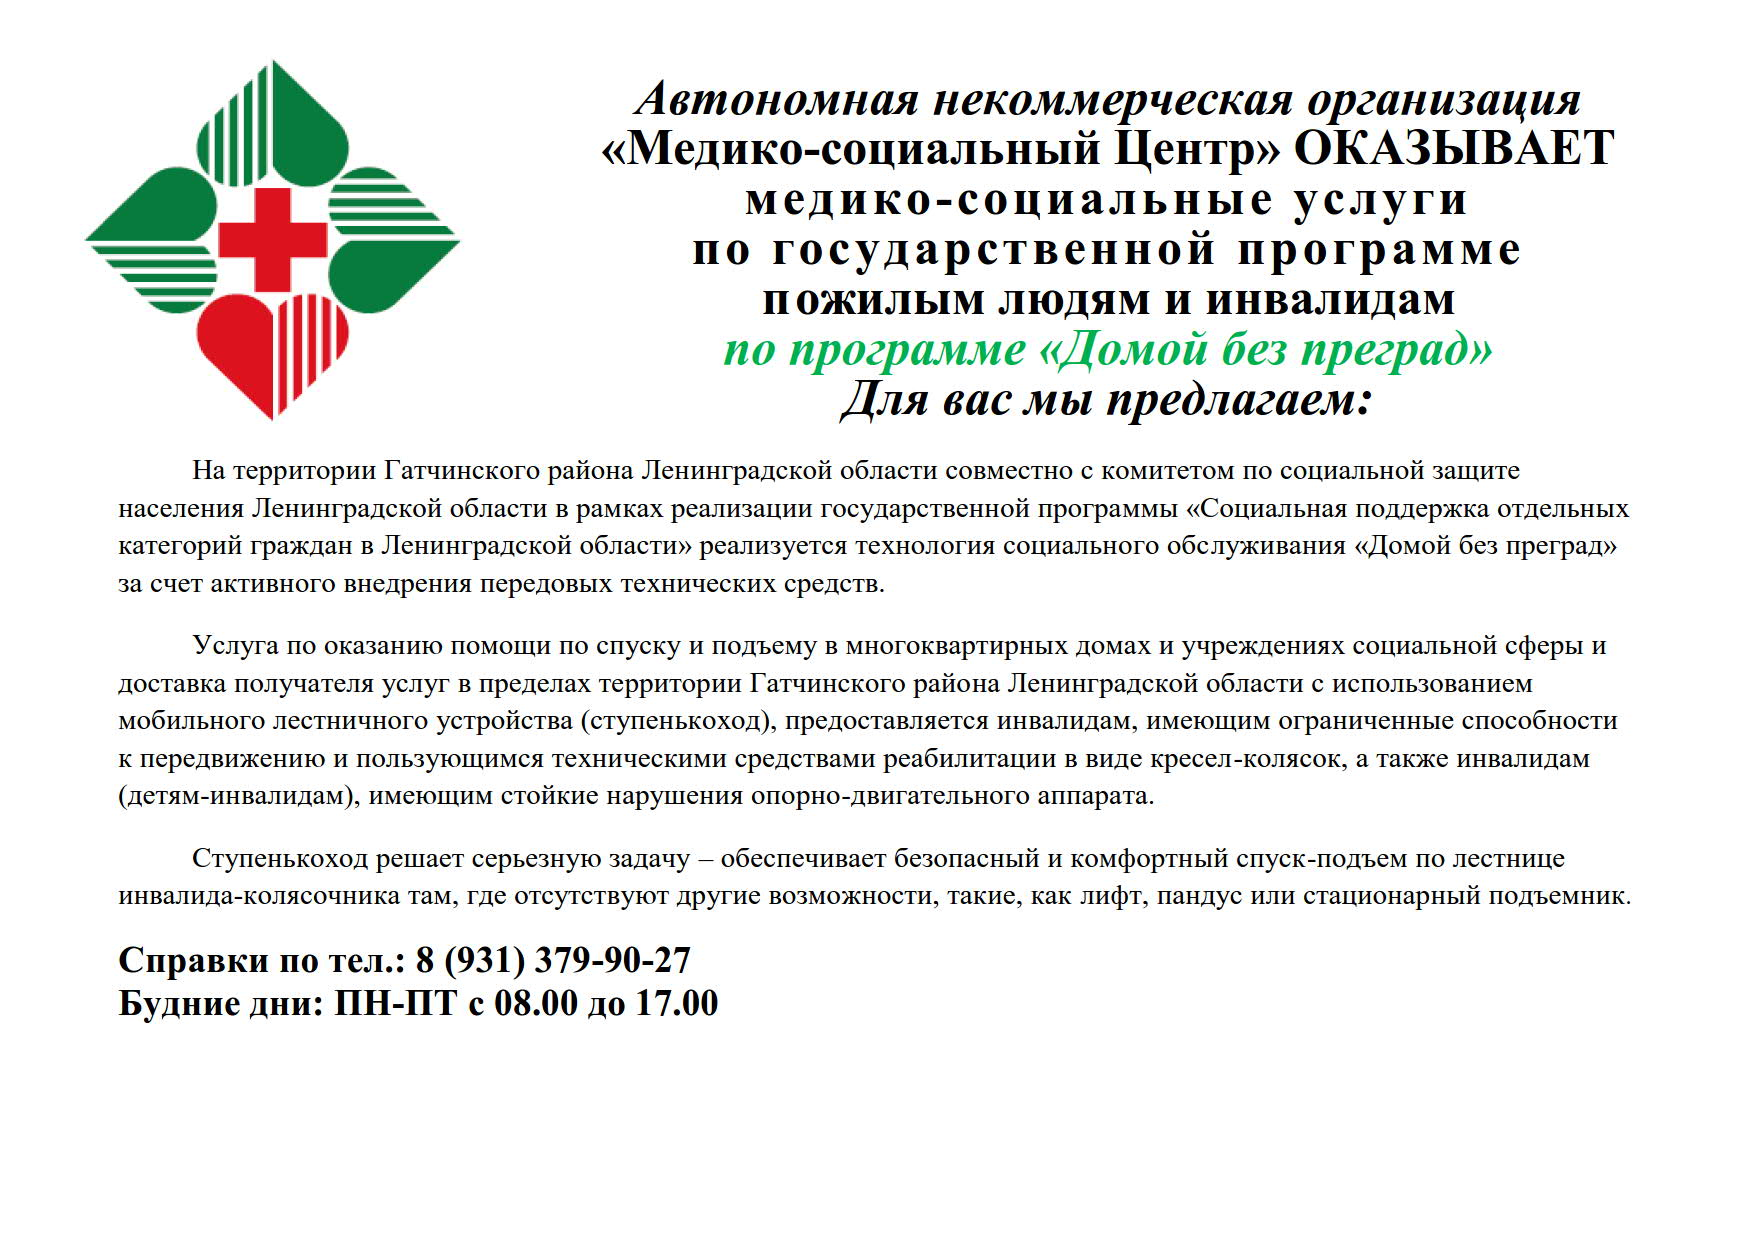 !Объявление МСЦ Домой без преград_1